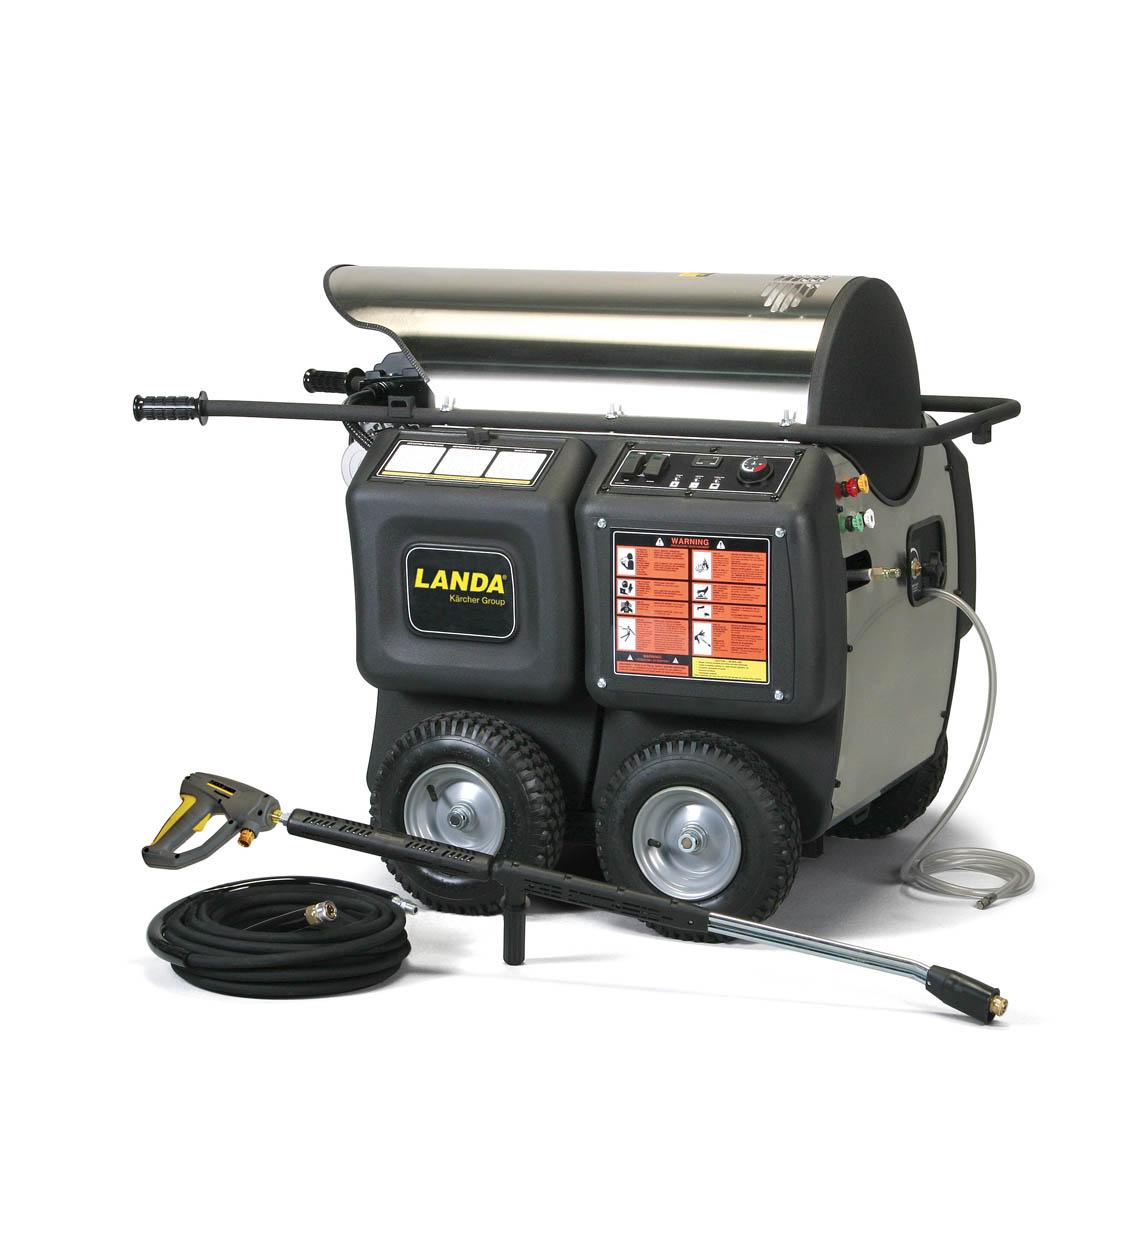 Landa Phw4 30024h Superior Cleaning Equipment